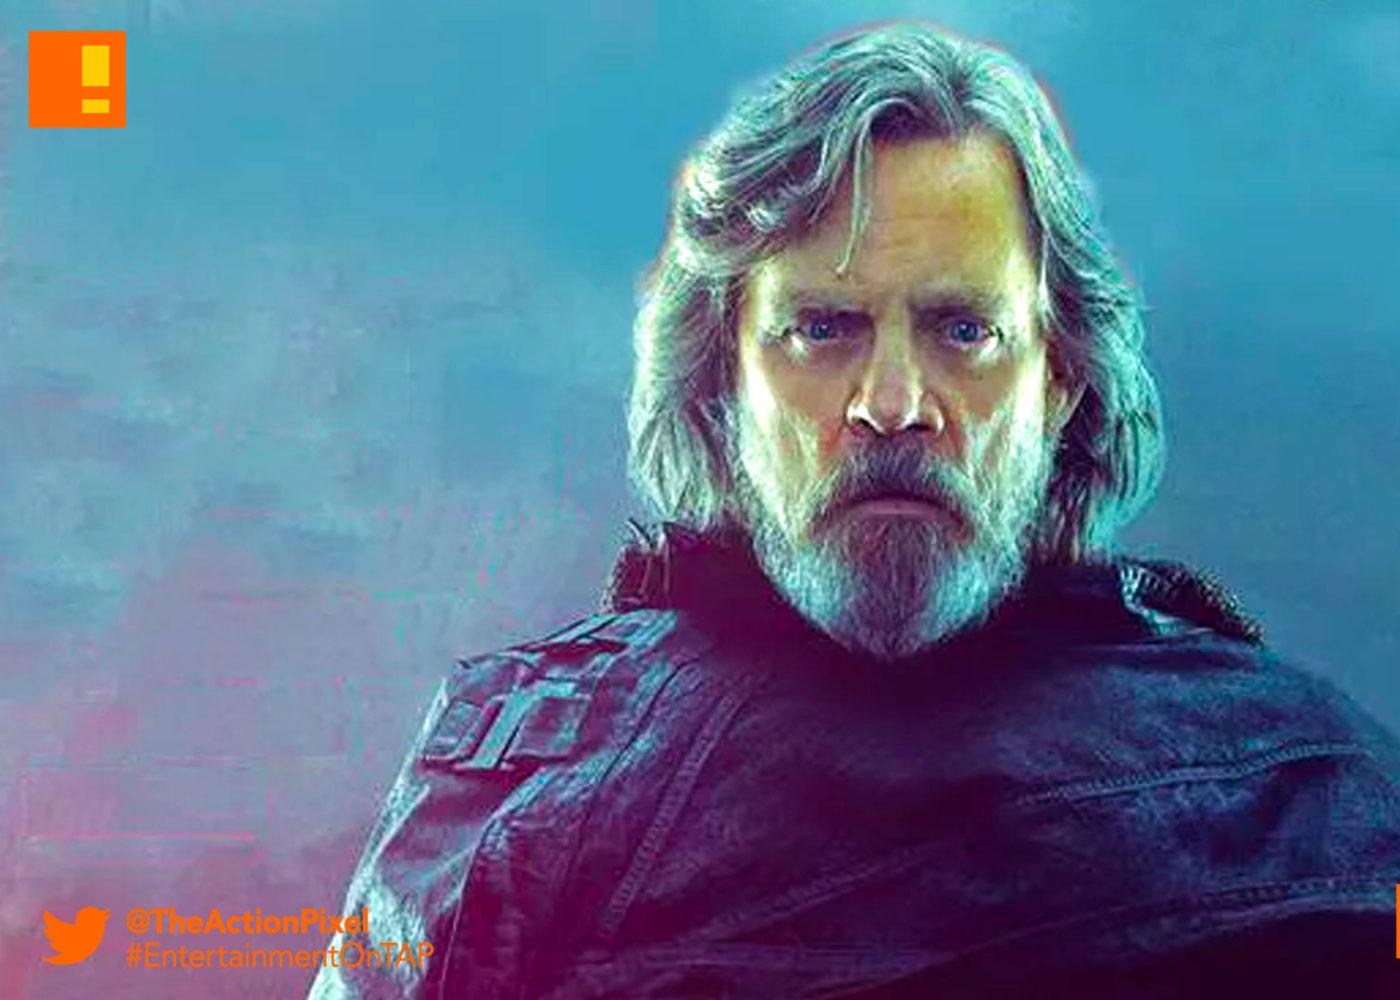 Rey, Poe, Luke, Leia,Finn,Kylo,star wars, star wars: the last jedi, the last jedi,disney, lucasfilm,posters, he last jedi, star wars, star wars: the last jedi, mark hamil, luke skywalker, princess leia,carrie fisher, rey,the action pixel, entertainment on tap,kylo ren, lego,